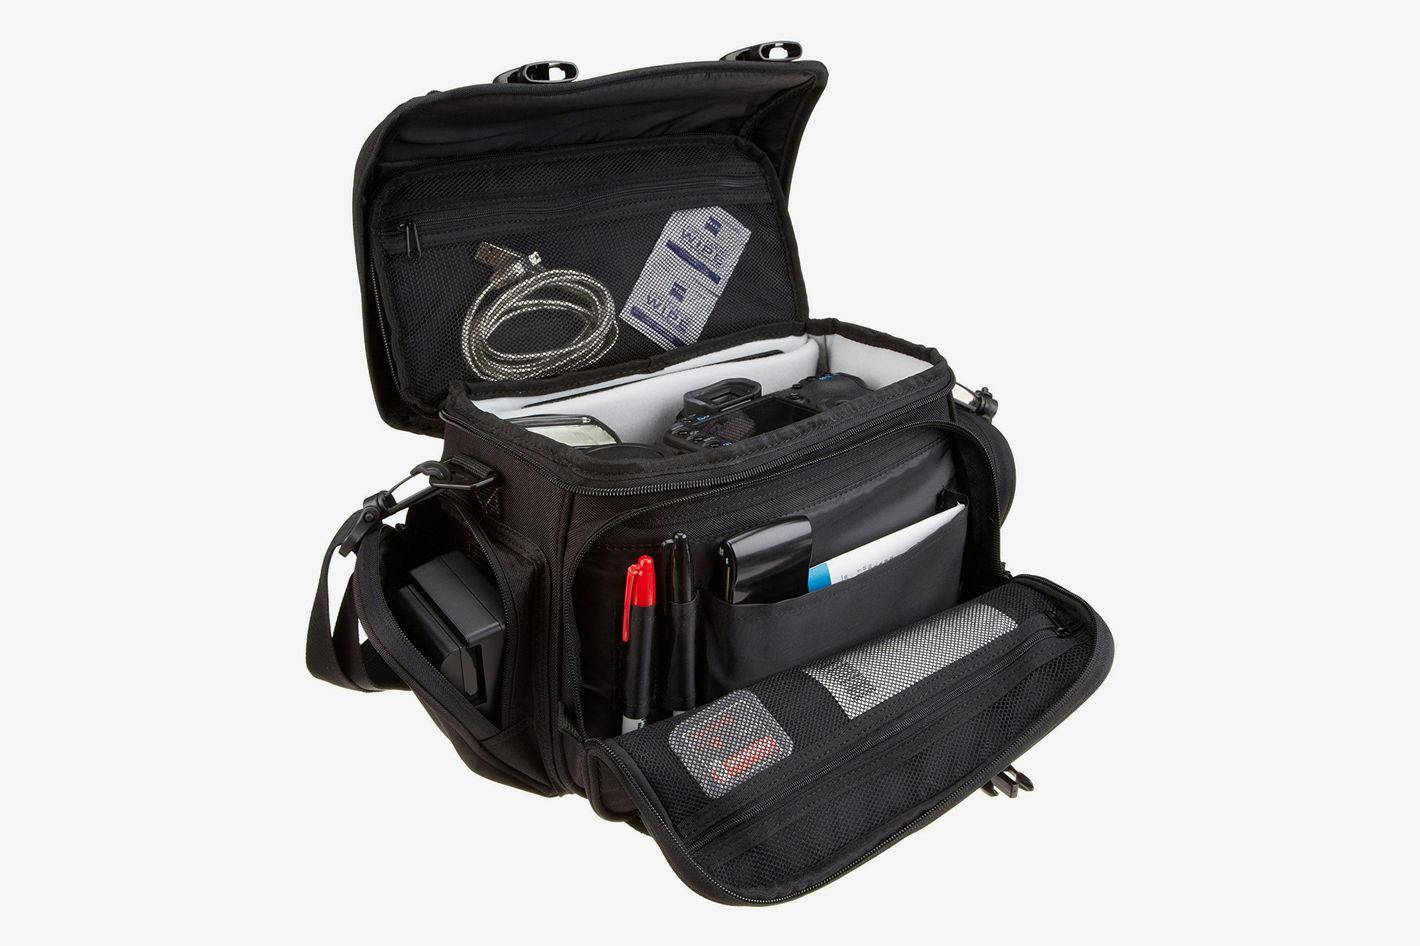 Basics Large Dslr Gadget Bag